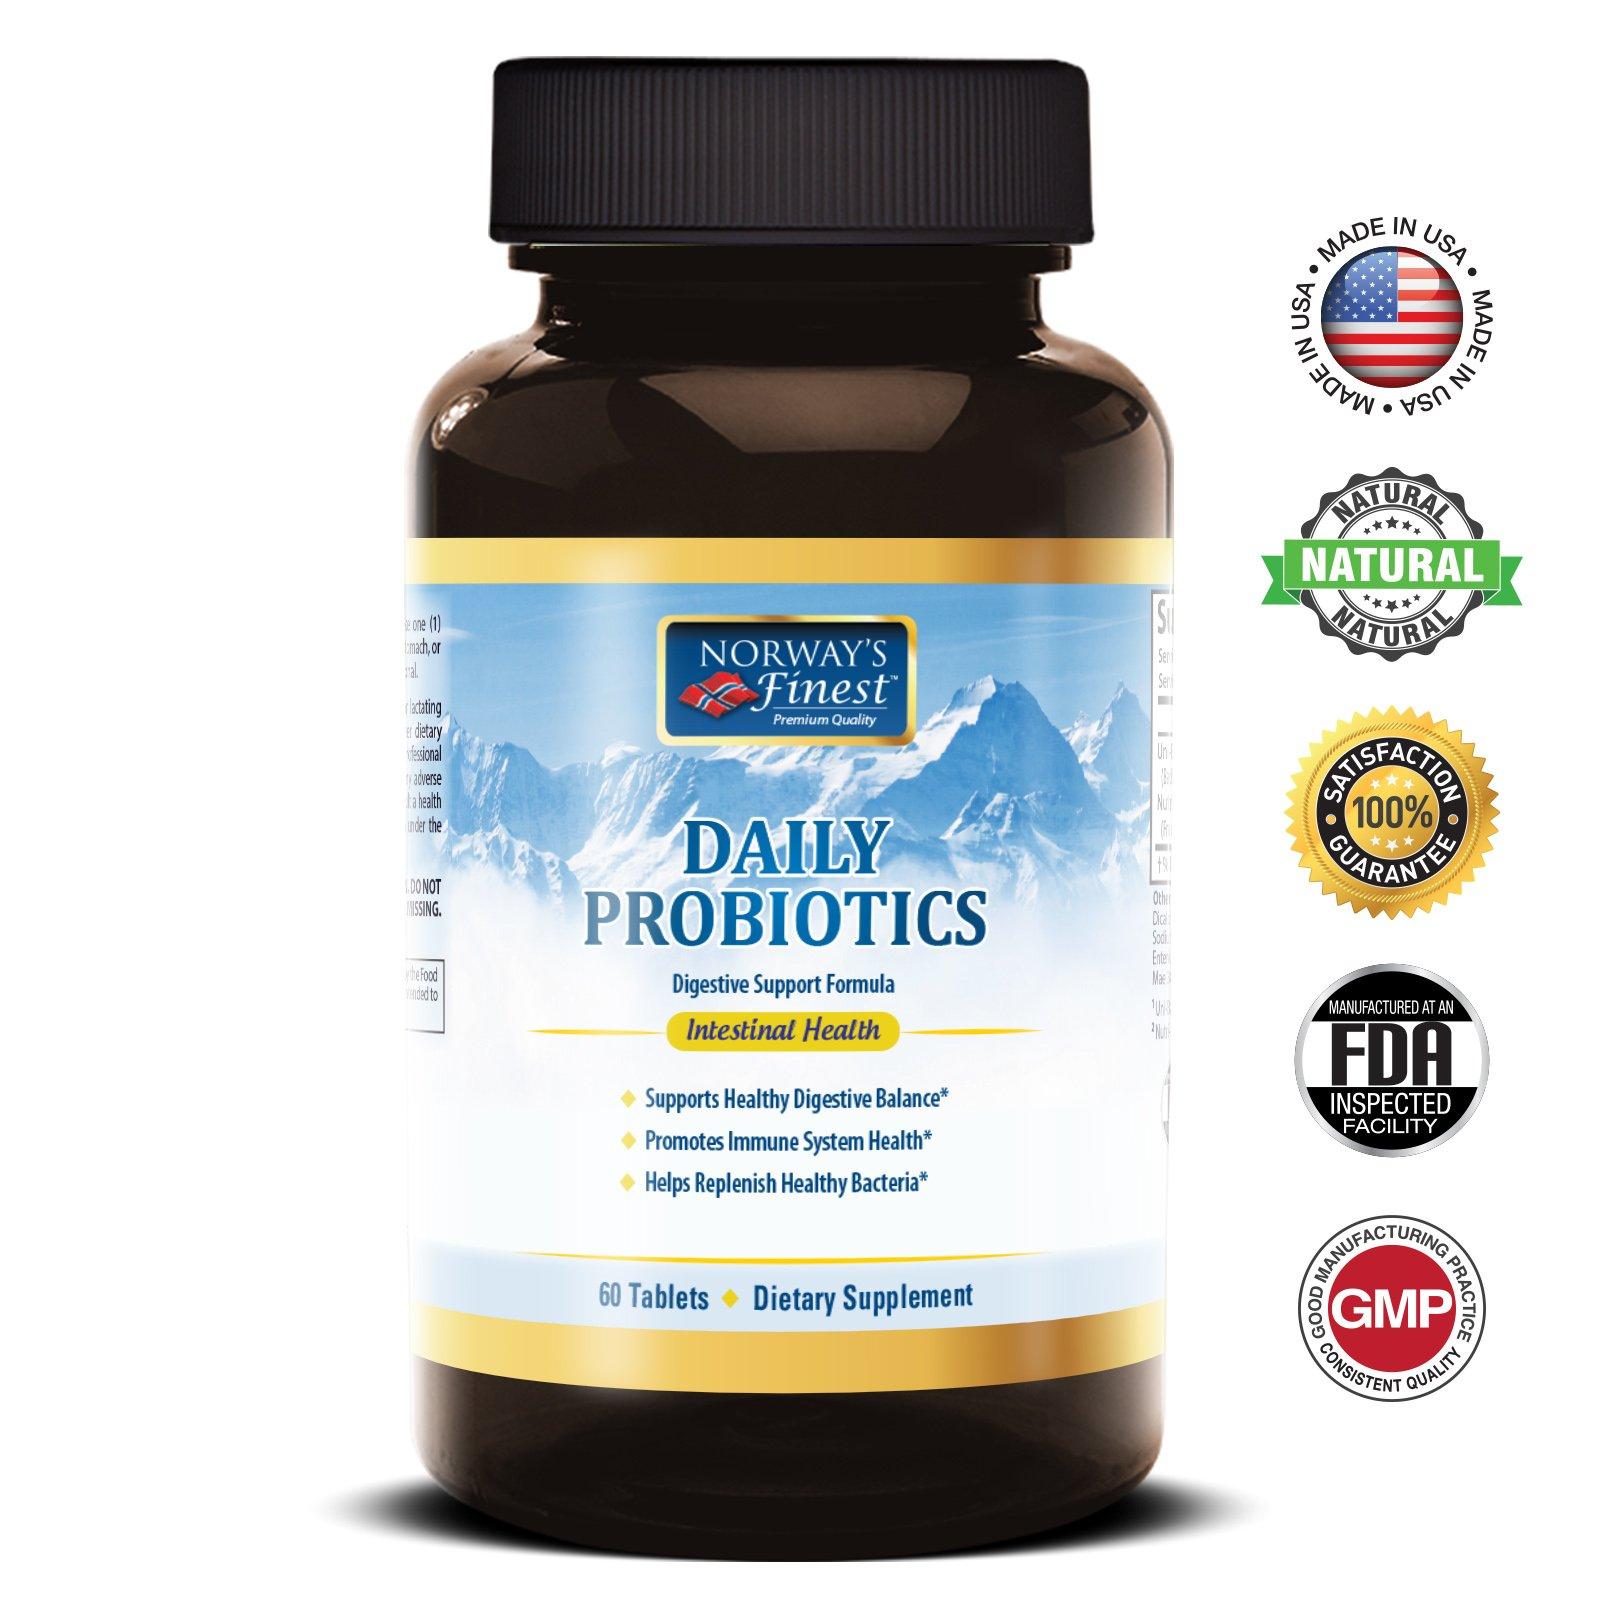 Norway's Finest Daily Probiotics - Digestive Support Formula - Multi-Probiotic 15 Billion - Multi-Strain Probiotic with Prebiotic Fos - 60 Tablets